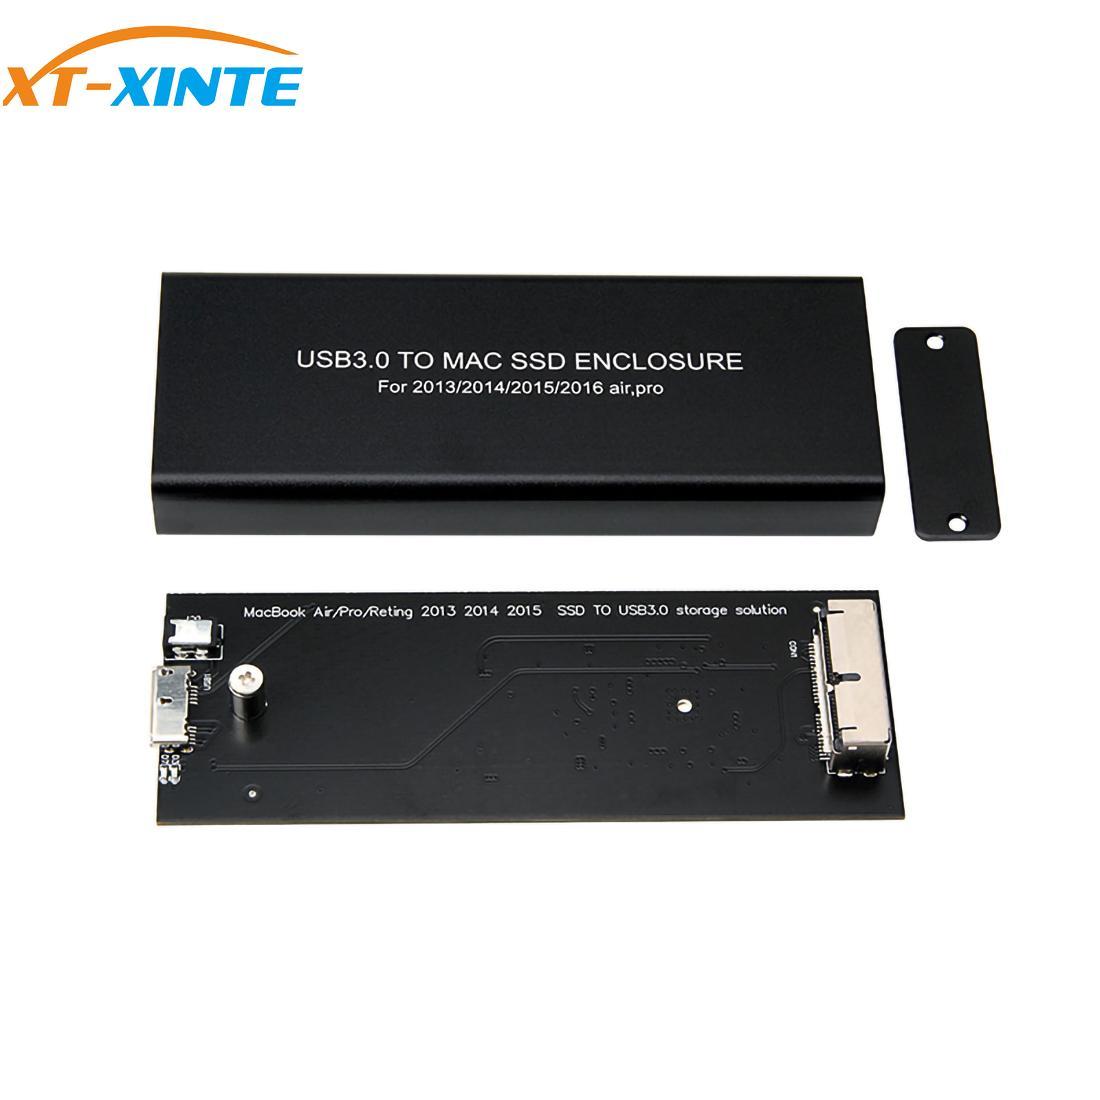 For Macbook Air Pro Retina 2013 2014 2015 2016 2017 Hard Disk Box A1466 A1465 A1398 A1502 USB 3.0 For Mac SSD Enclosure HDD Case